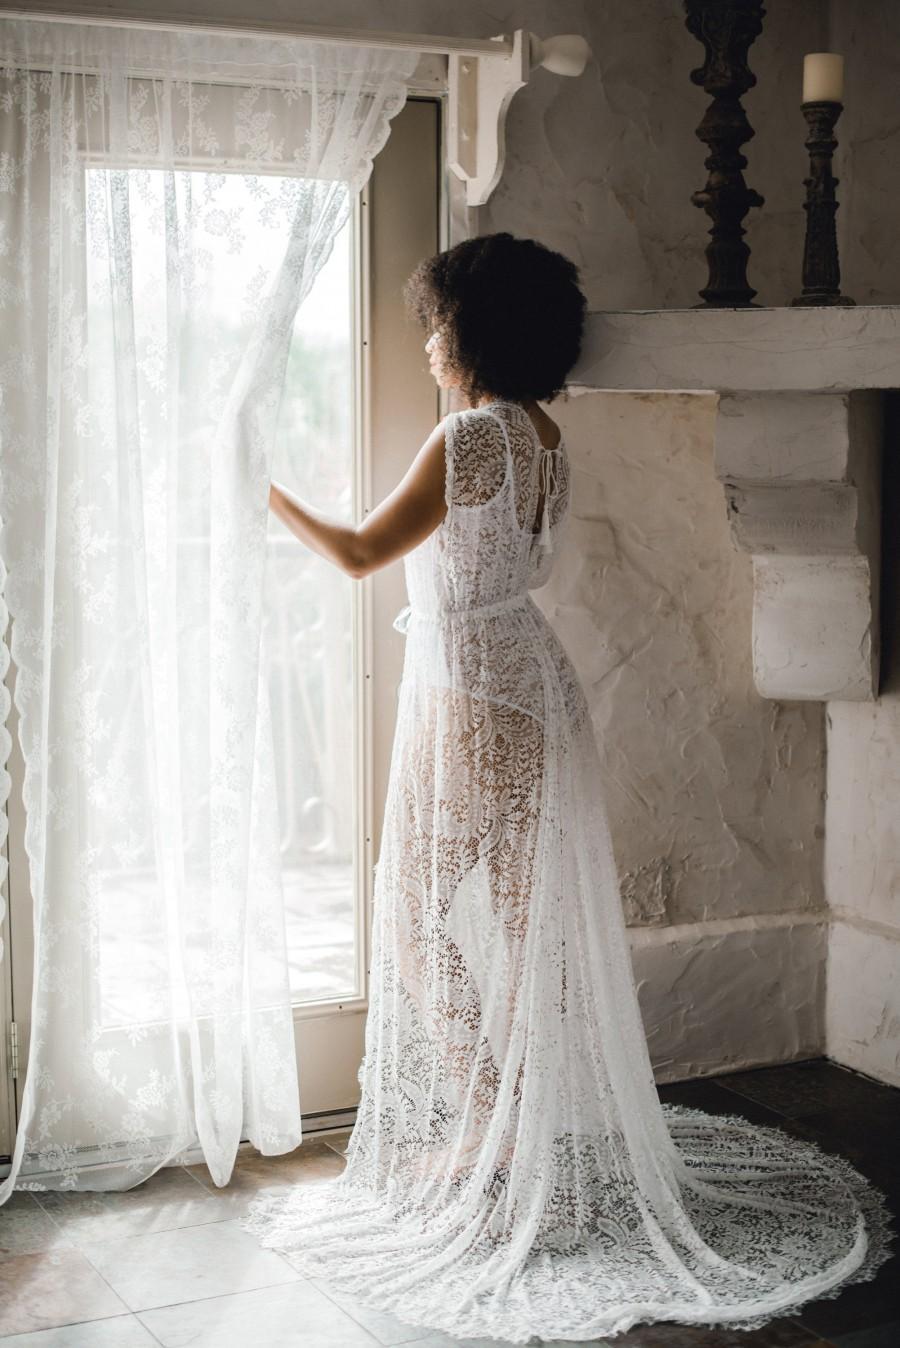 Wedding - LACE BRIDAL ROBE off white sleeveless with train, boudoir, wedding day robe, for photo shoot, wedding lingerie, shower gift, wedding gift